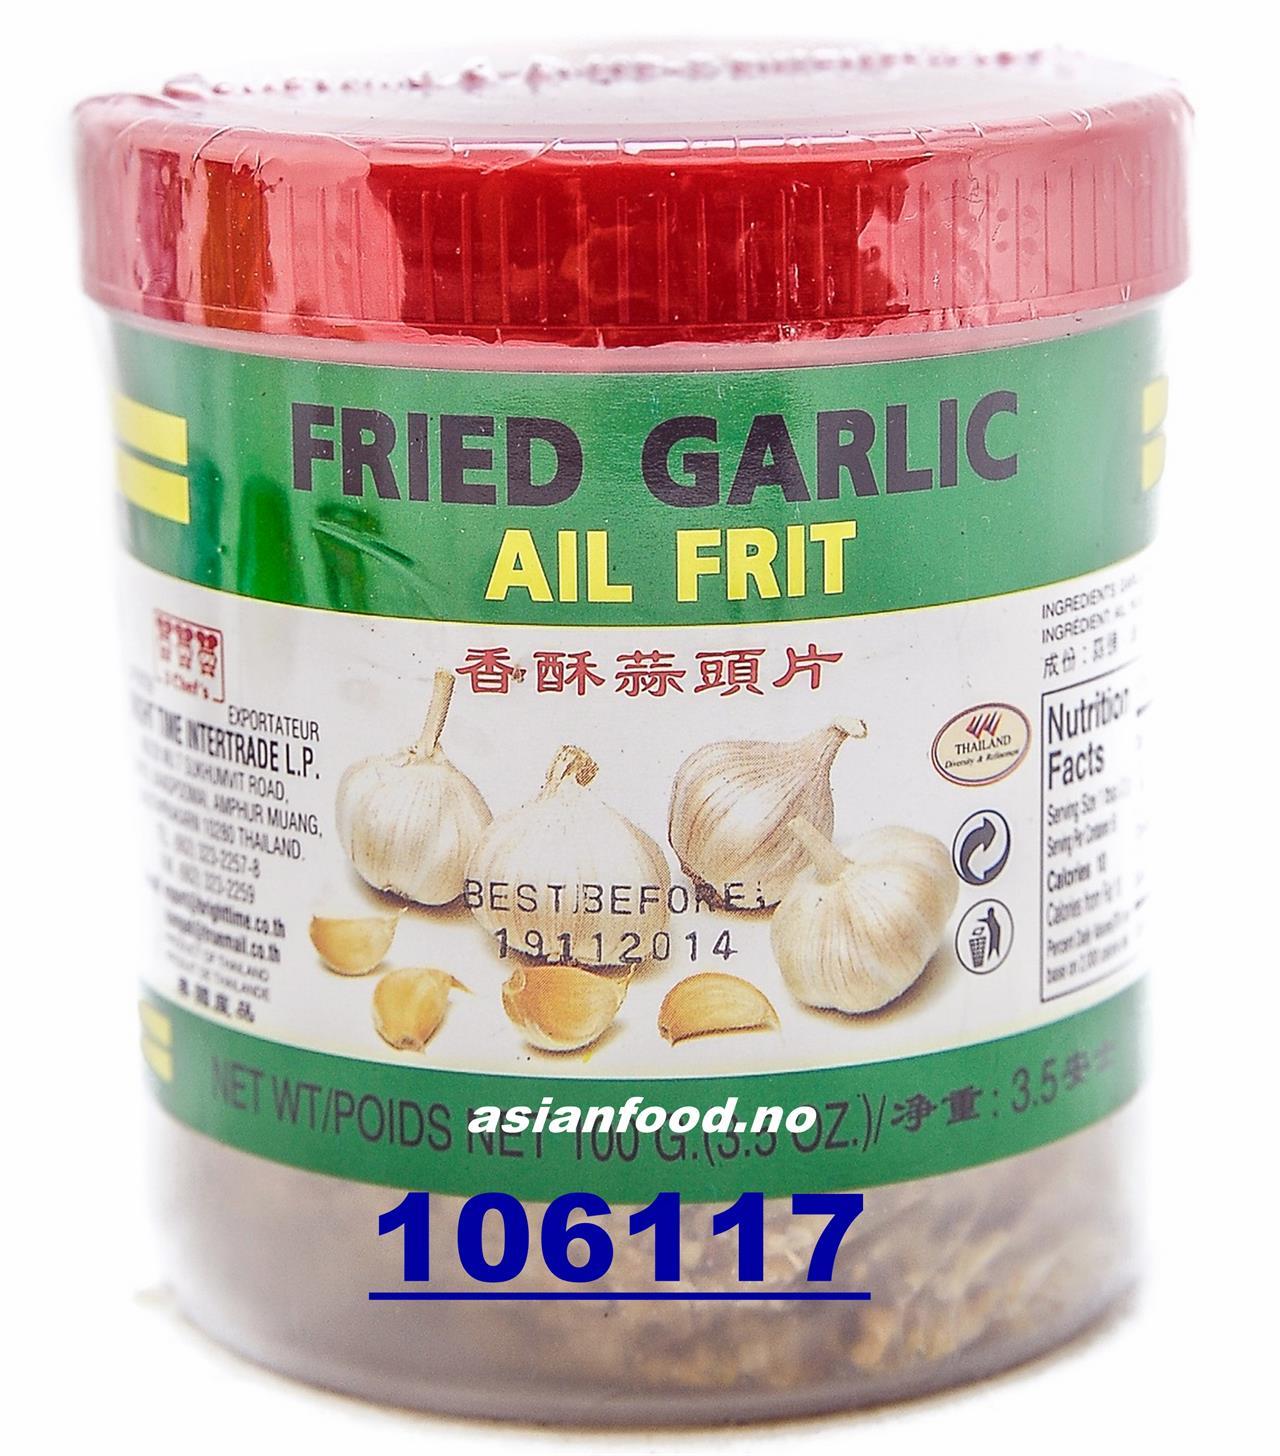 3 CHEFS fried garlic 100g